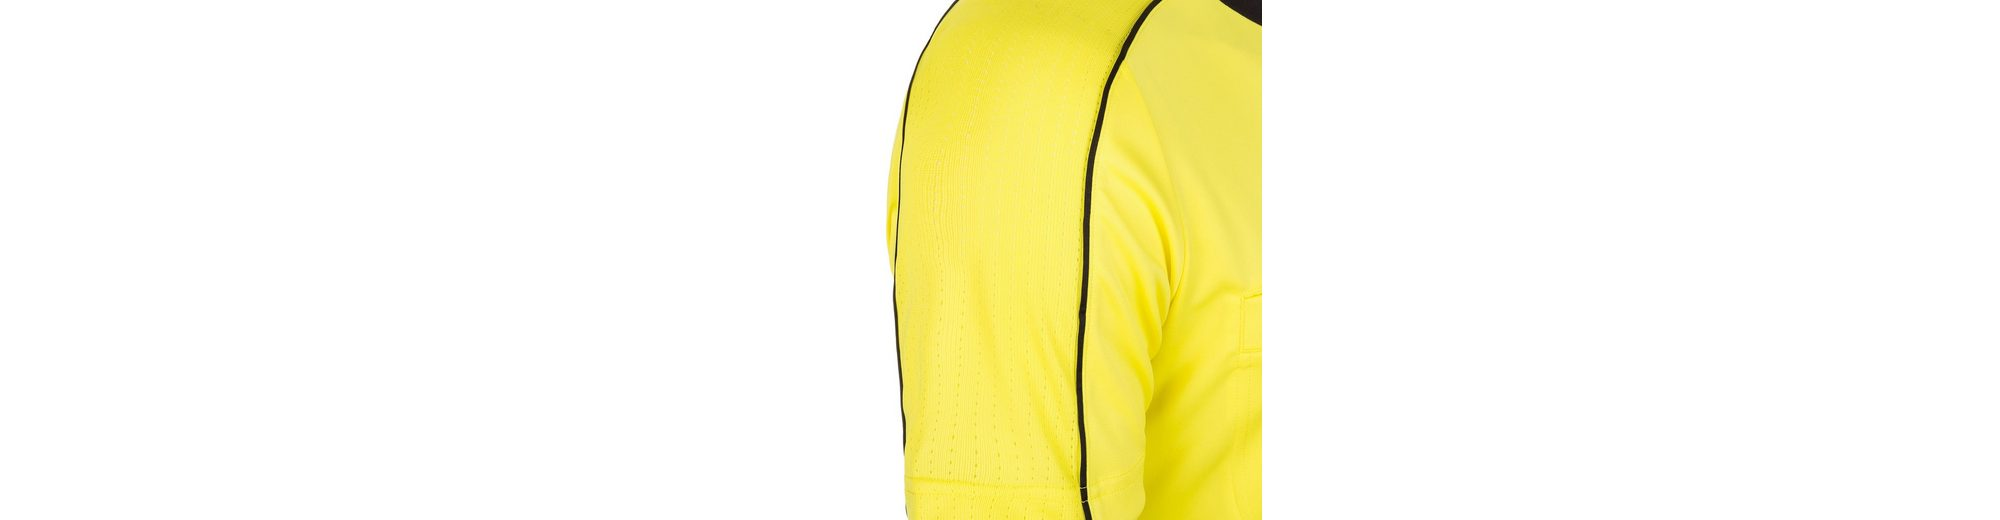 adidas Performance Referee 16 Schiedsrichtertrikot Herren Footaction Günstiger Preis f8D6QBgJW